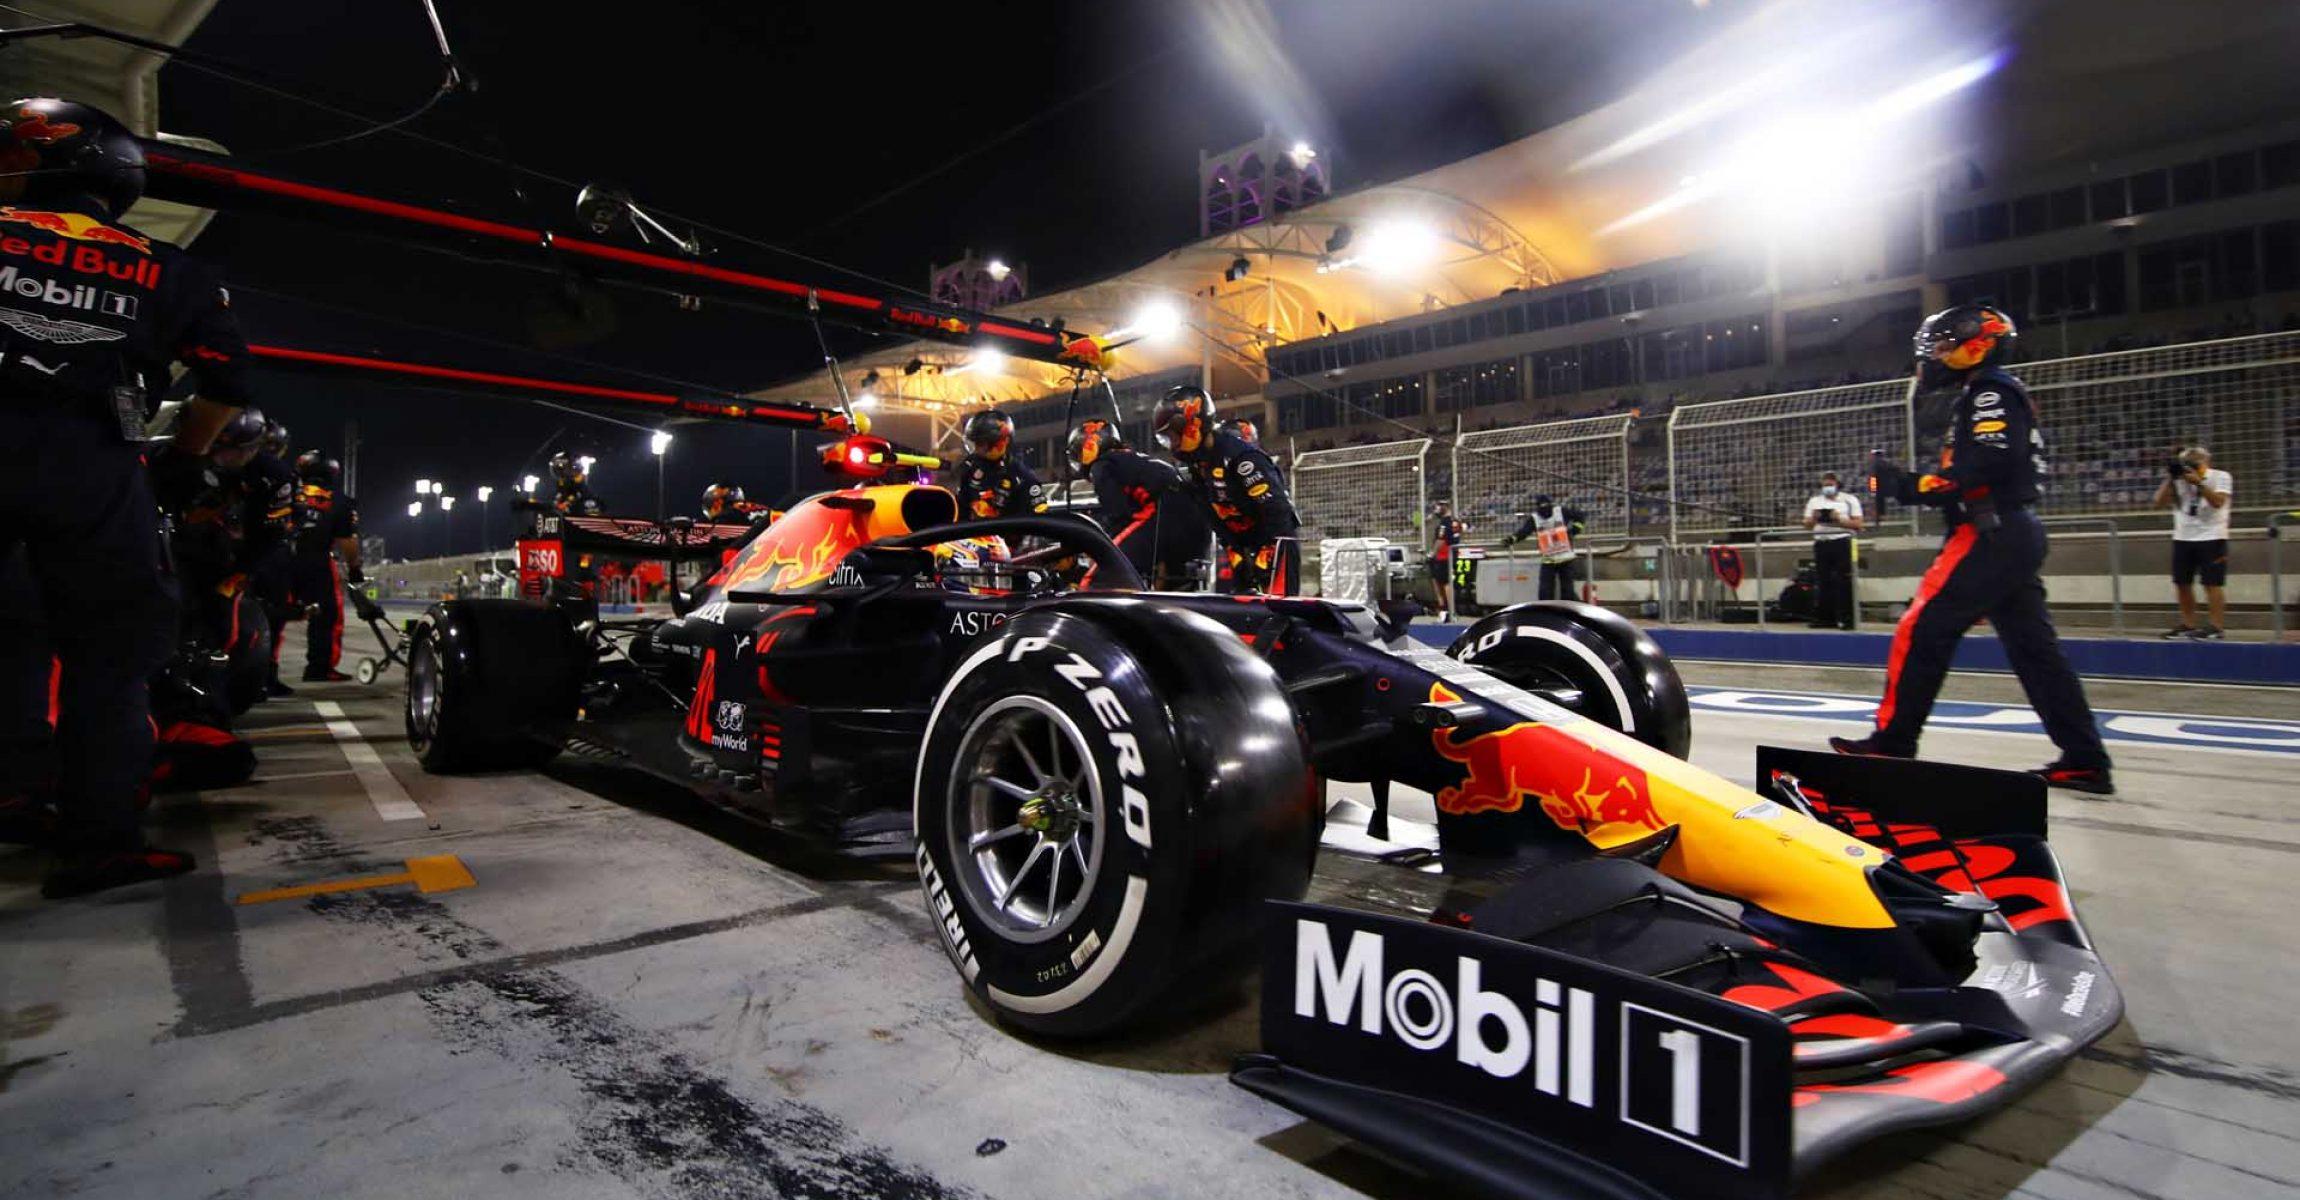 BAHRAIN, BAHRAIN - NOVEMBER 29: Alexander Albon of Thailand driving the (23) Aston Martin Red Bull Racing RB16 makes a pitstop during the F1 Grand Prix of Bahrain at Bahrain International Circuit on November 29, 2020 in Bahrain, Bahrain. (Photo by Mark Thompson/Getty Images)